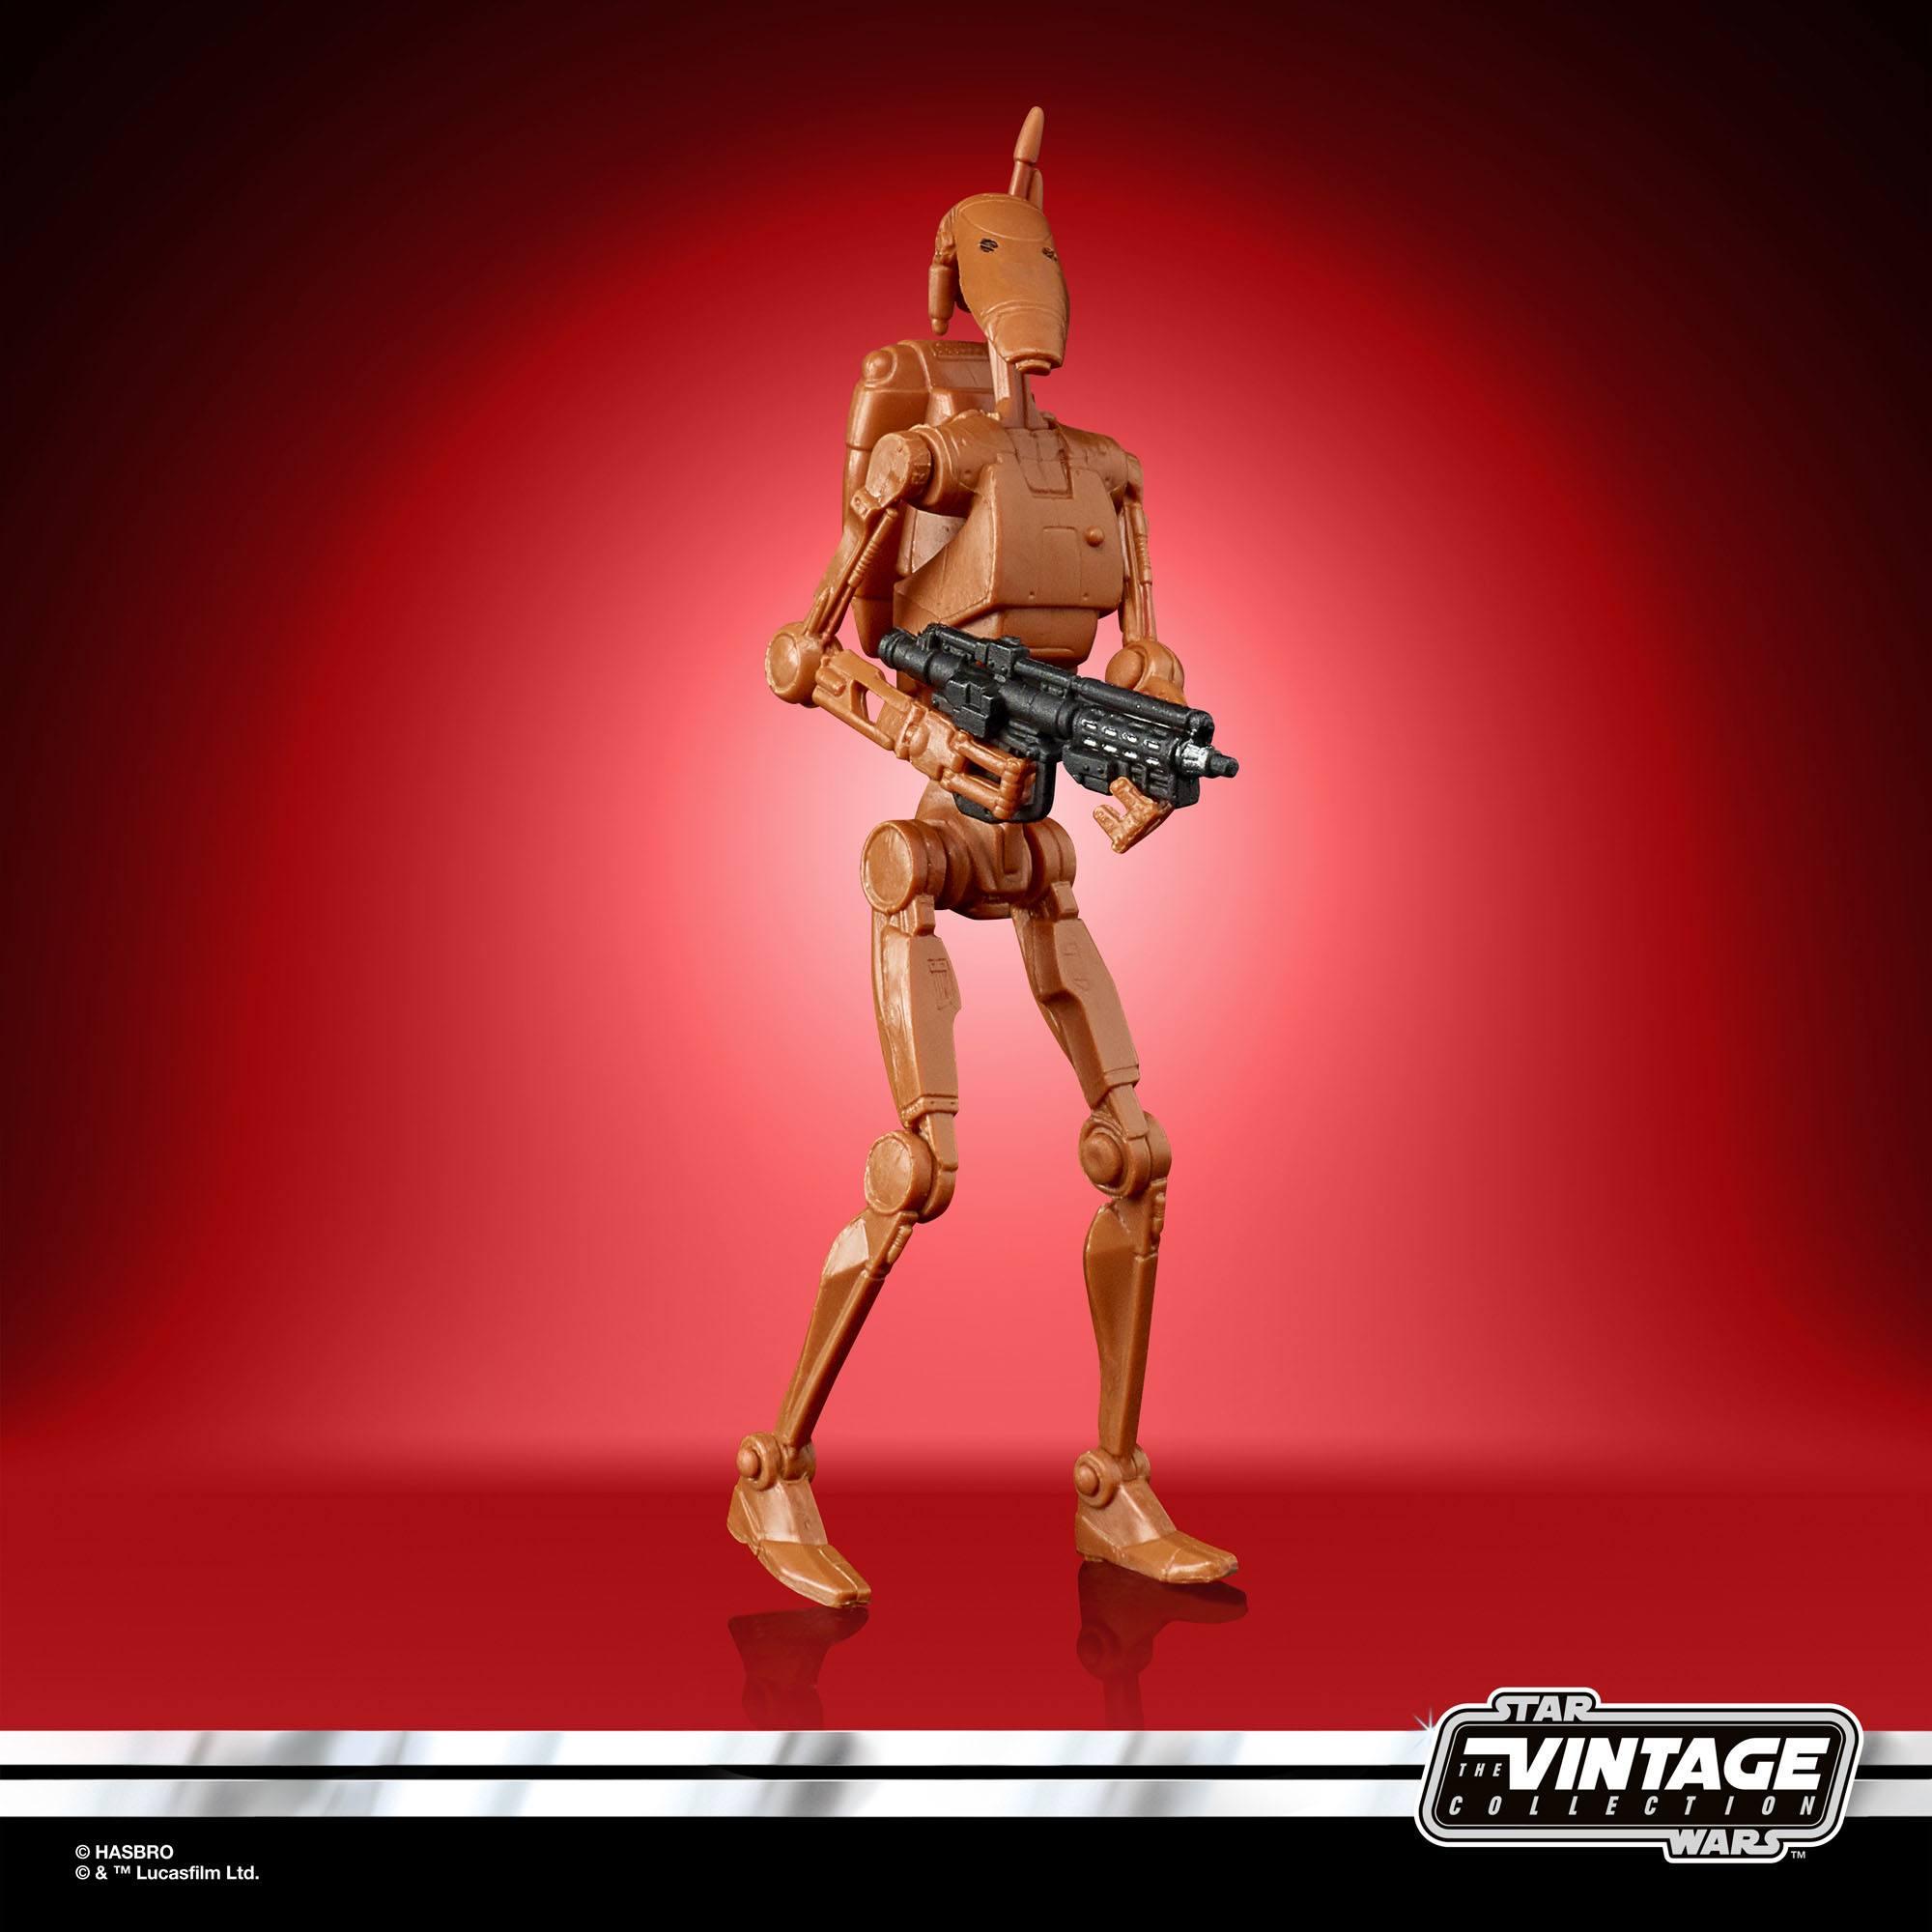 Star Wars The Clone Wars Vintage Collection Actionfigur 2022 Battle Droid 10 cm F58655L00 5010993985449